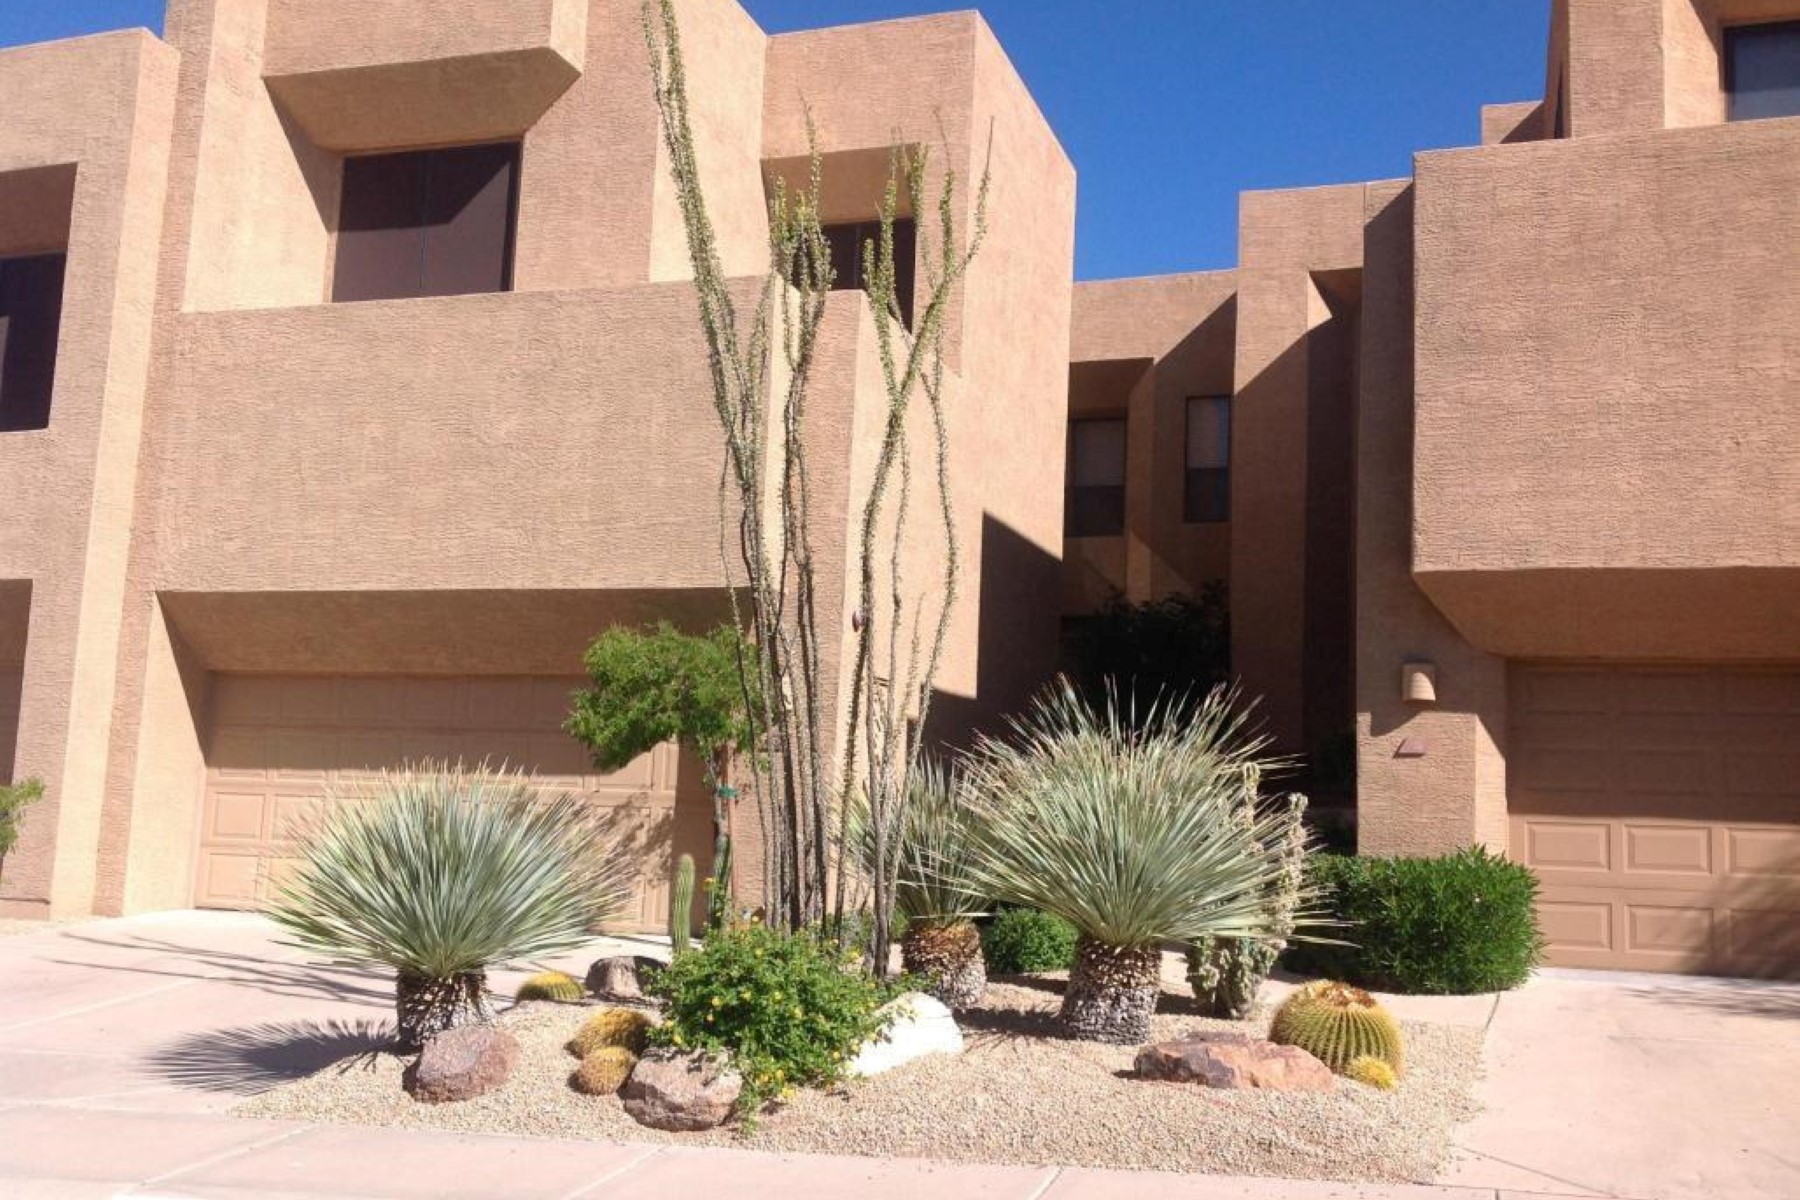 Residência urbana para Venda às Tranquil townhome in most desirable setting against backdrop of Troon Mountain 25555 N Windy Walk Dr #73 Scottsdale, Arizona, 85255 Estados Unidos